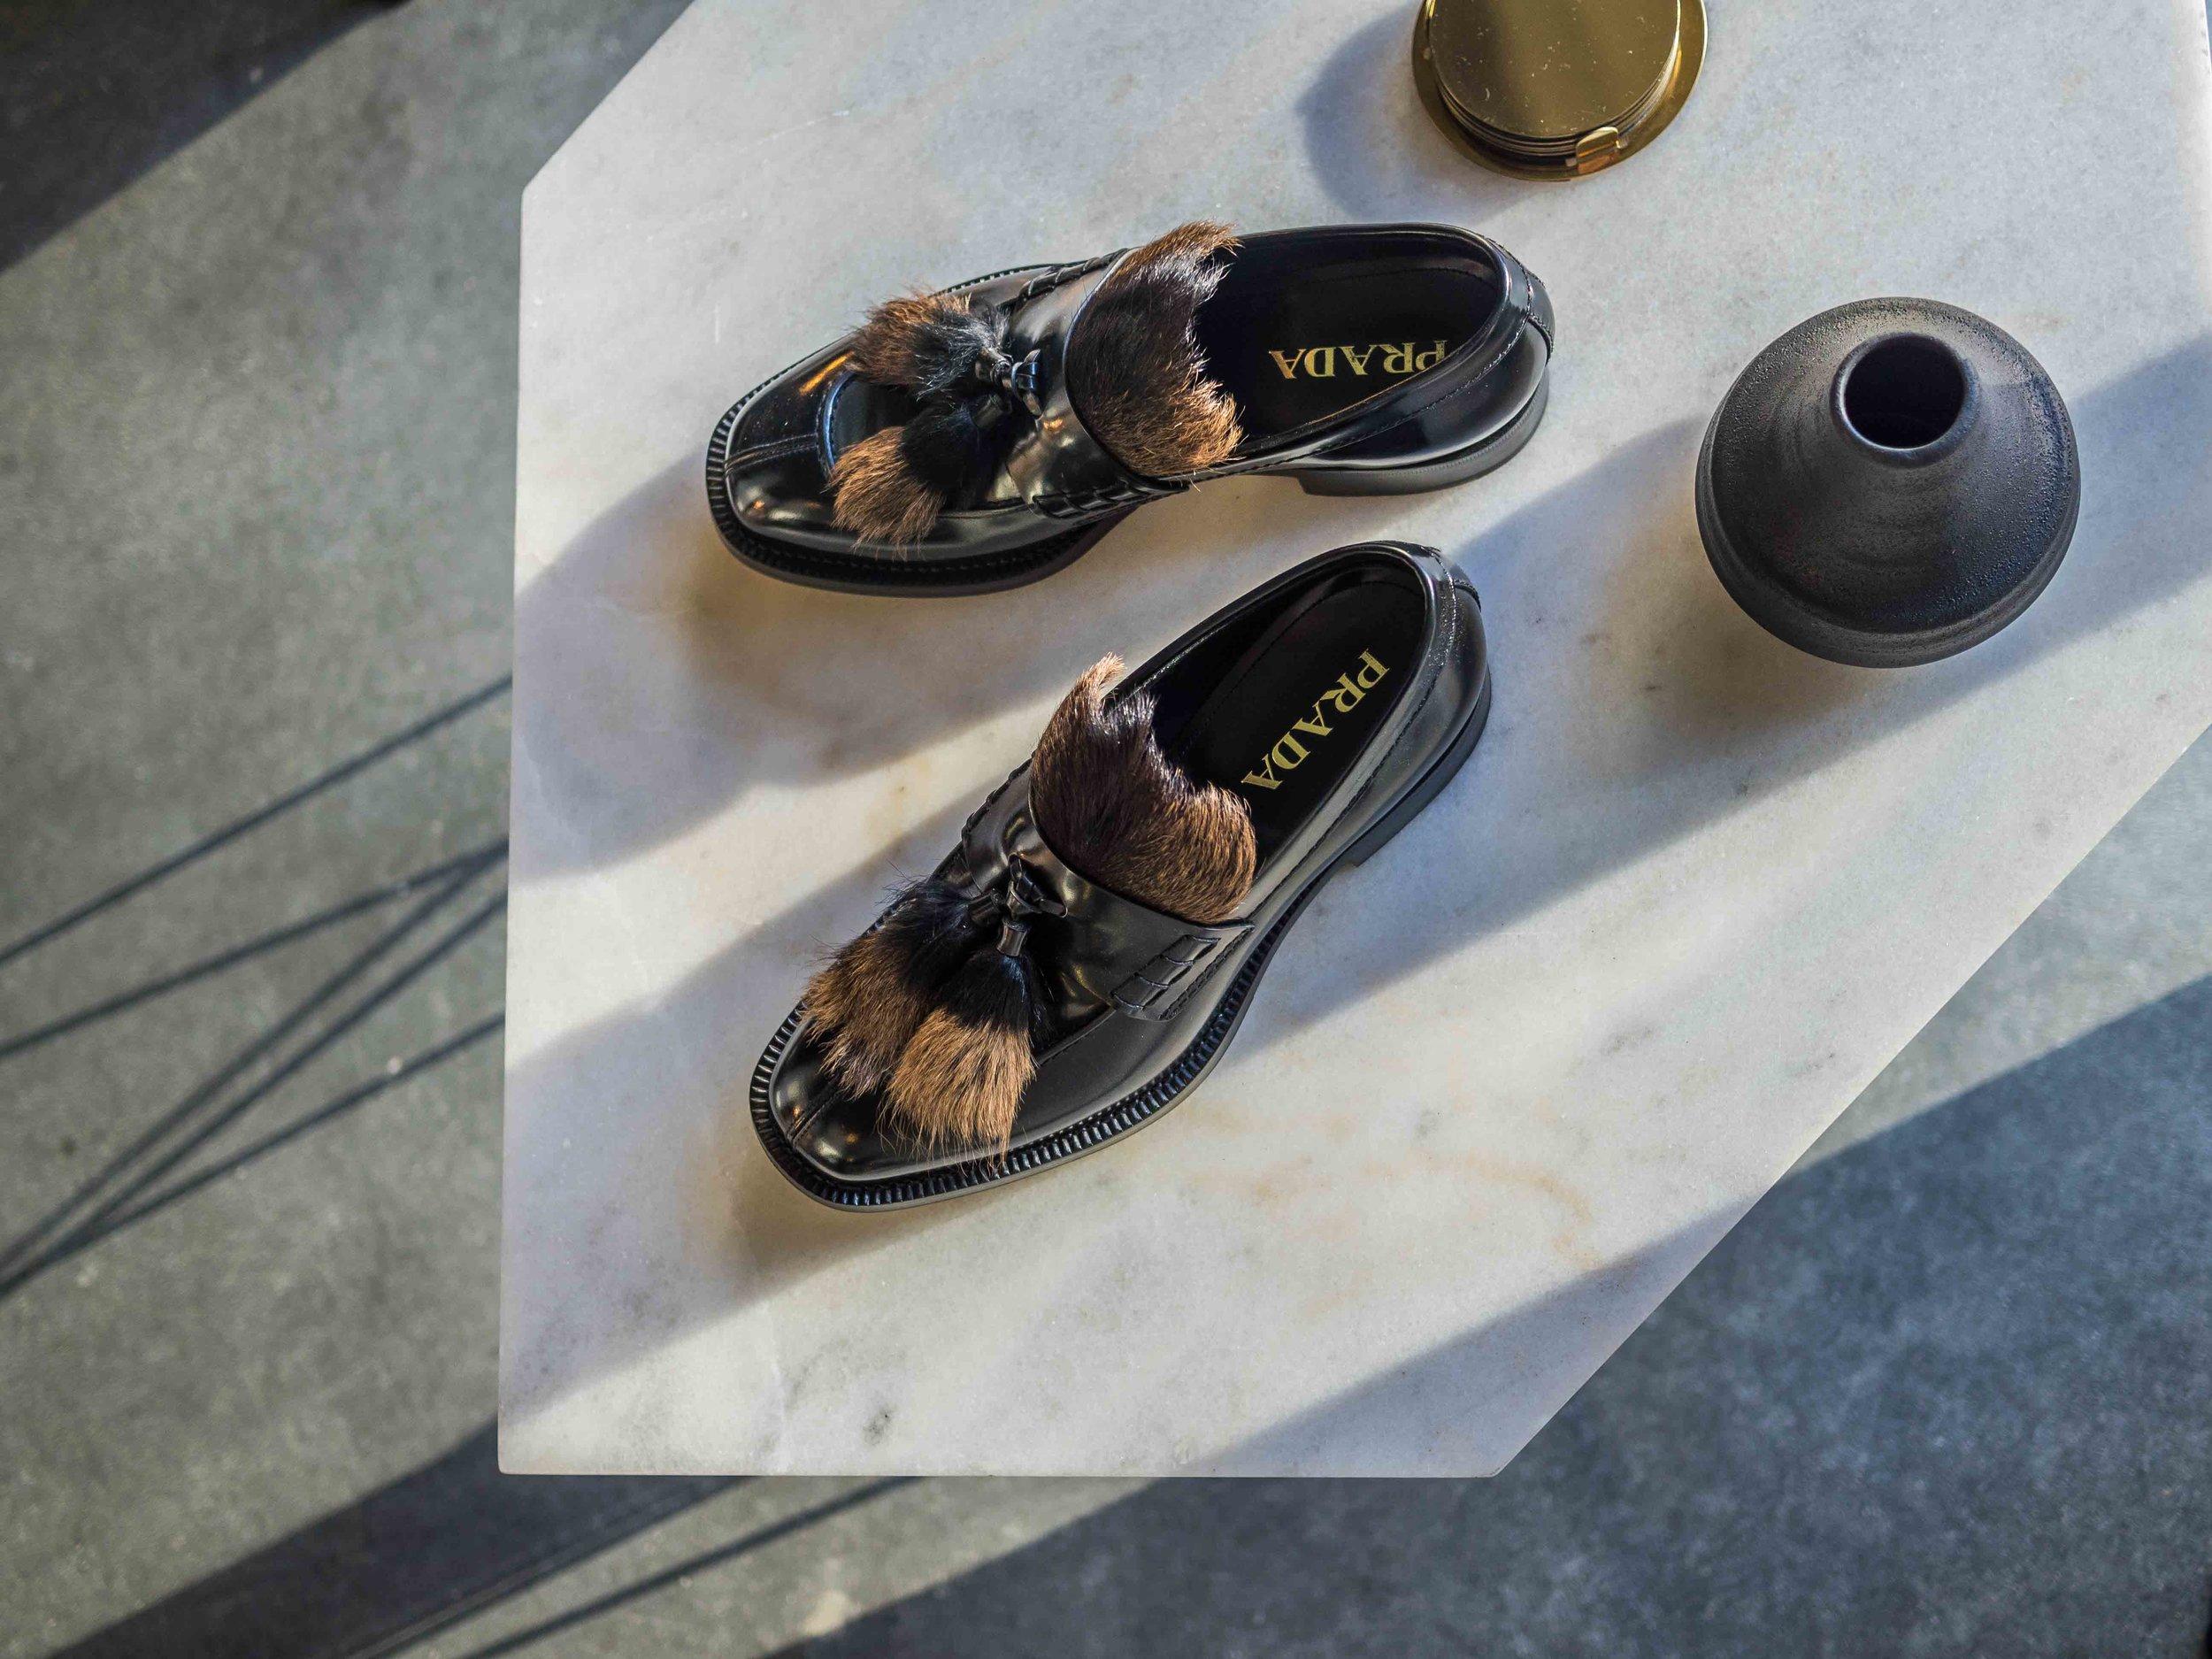 baa40a51 Gucci Gucci, Prada Prada: I Can't Get Enough of Fur Loafers ...